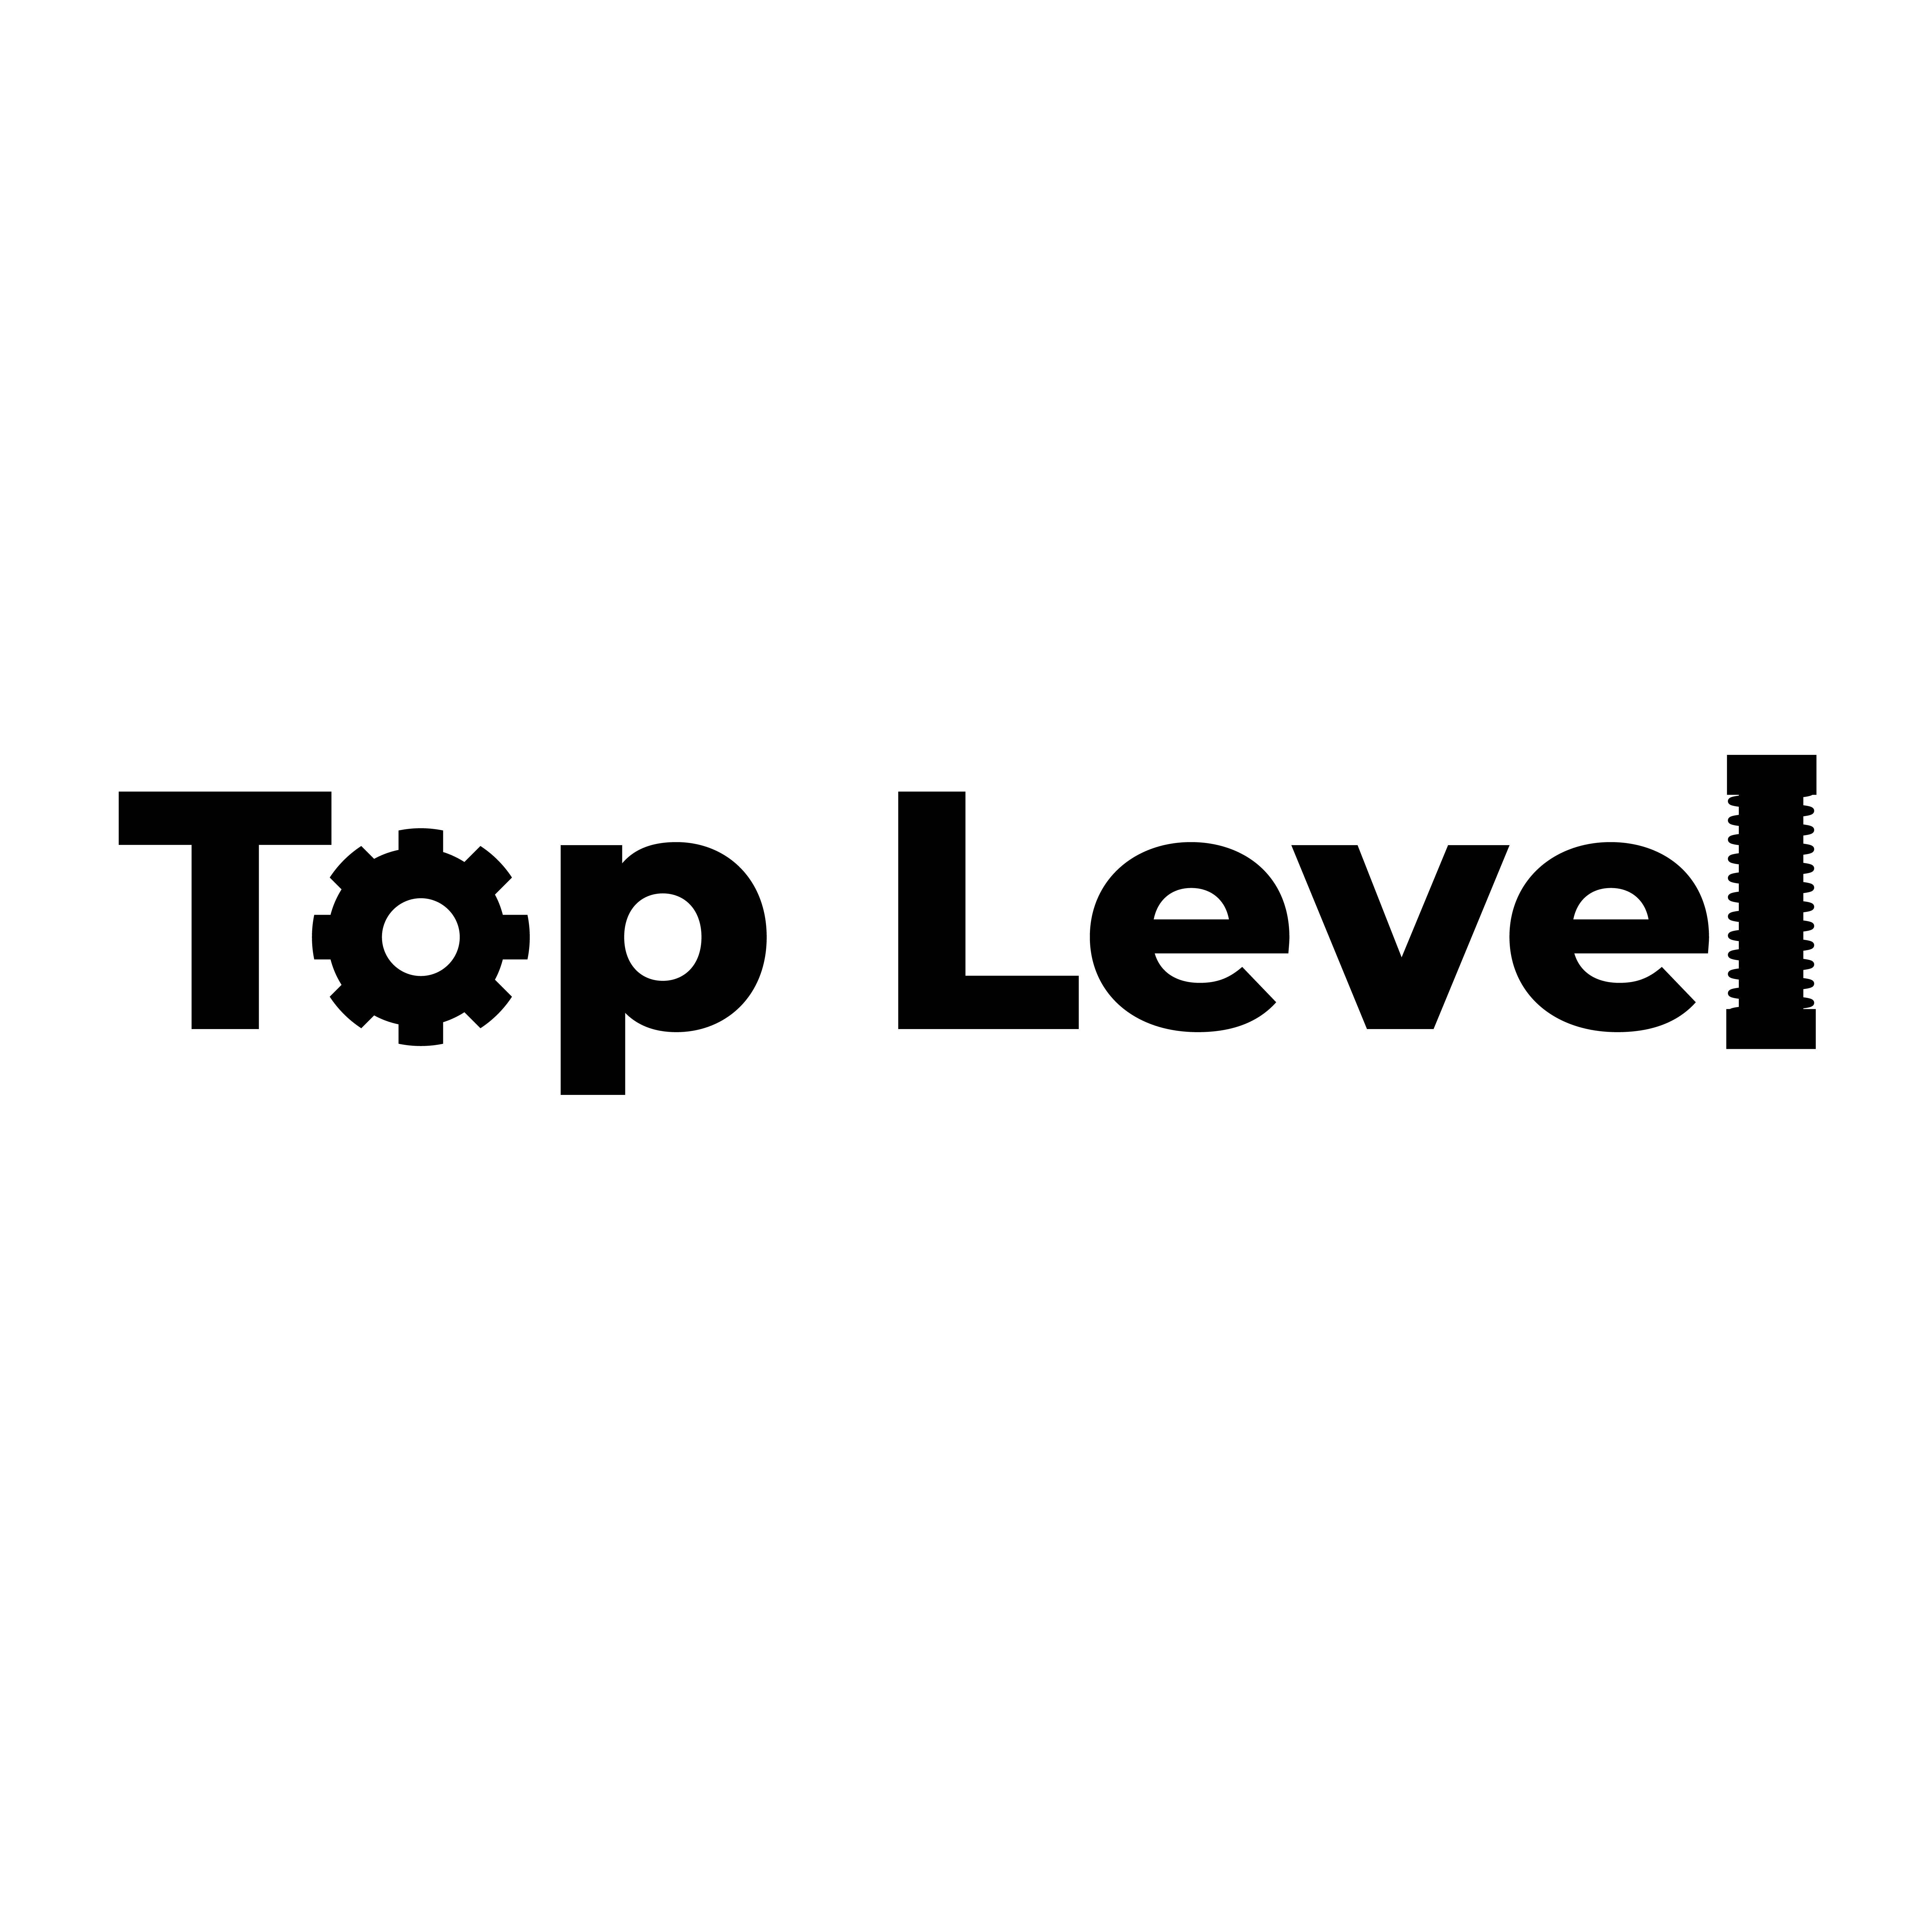 Разработка логотипа для тюнинг ателье фото f_3515f45ba19edd3b.jpg